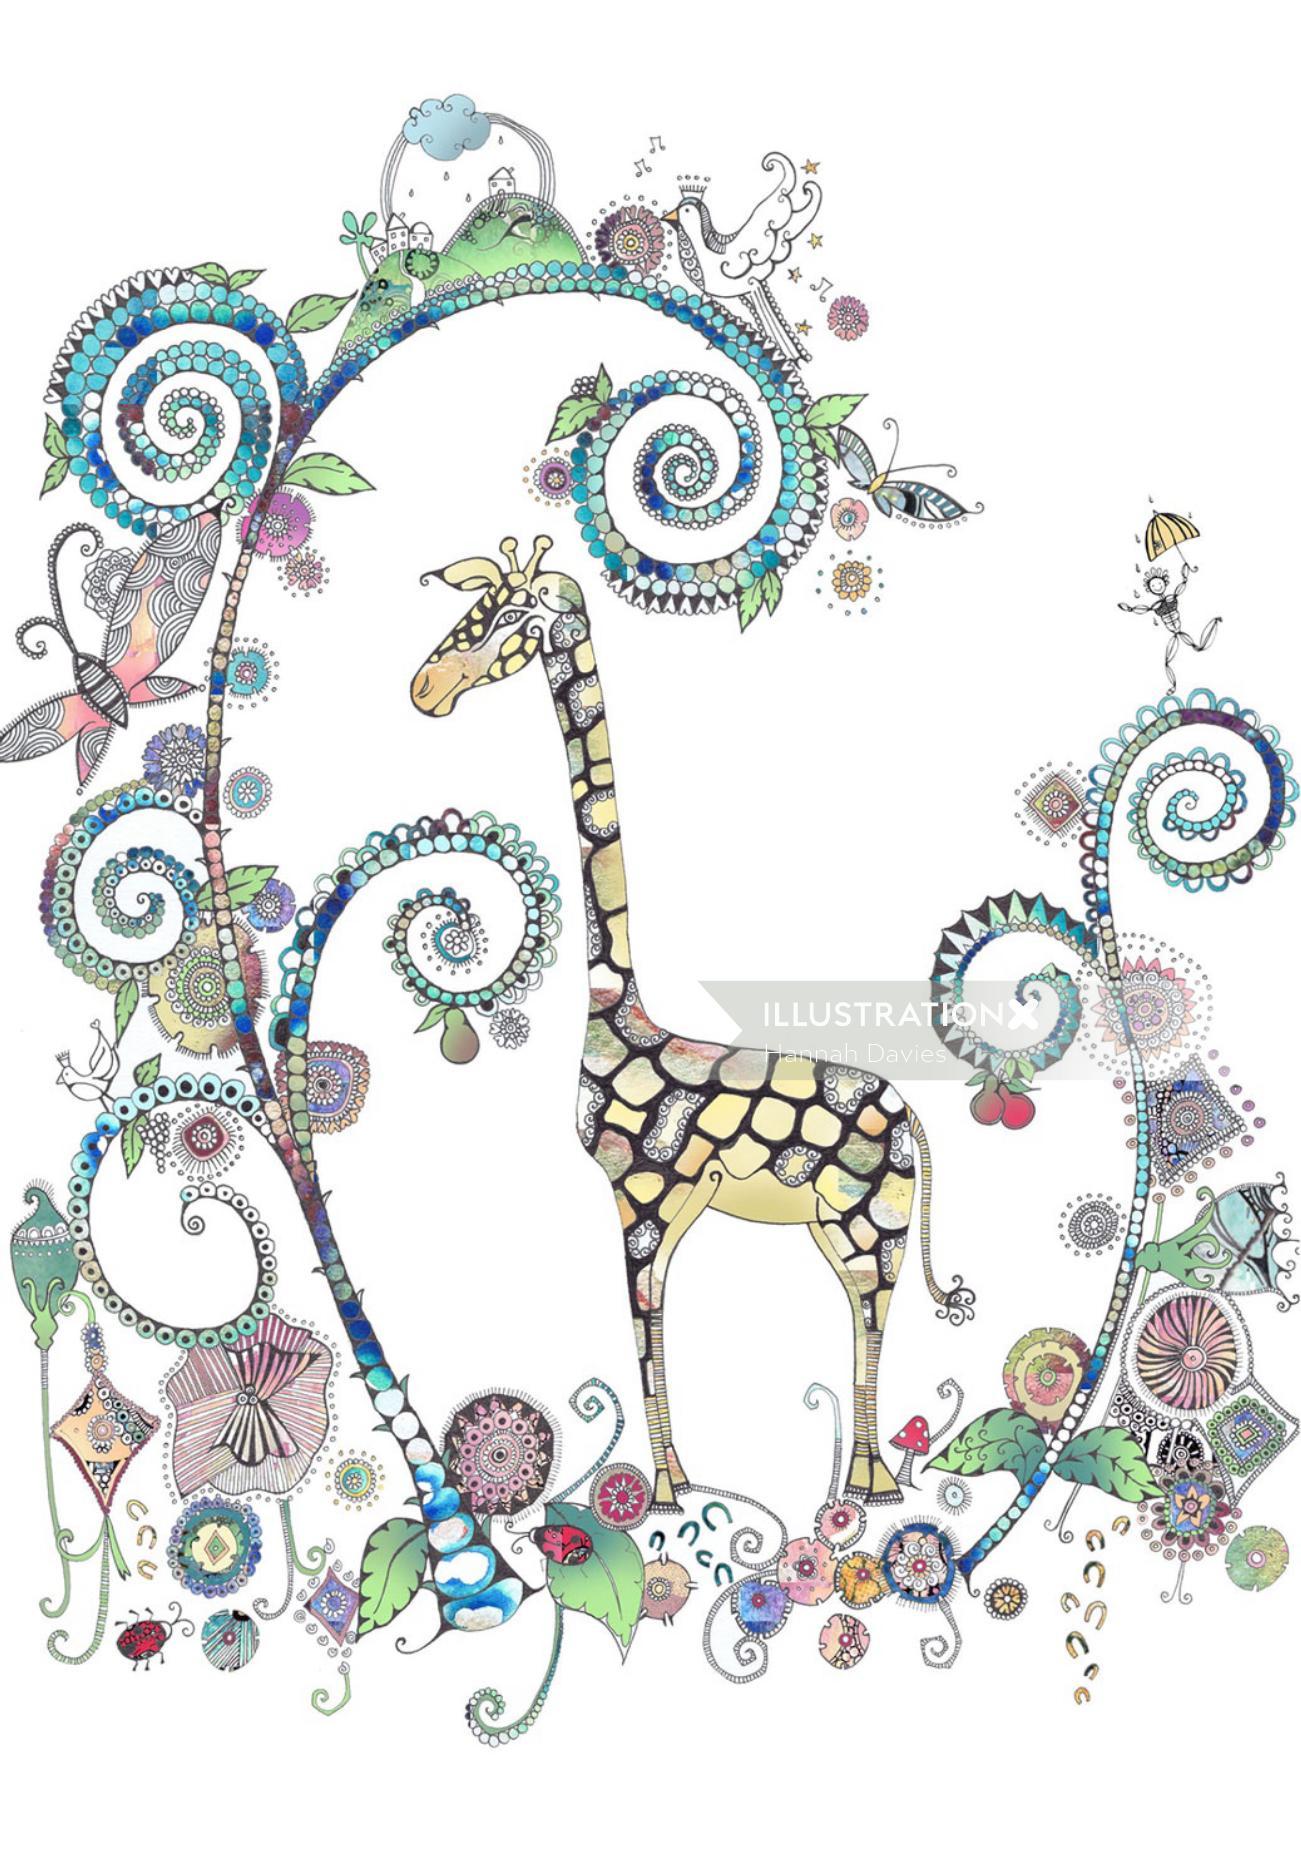 Giraffe illustration by Hannah Davies